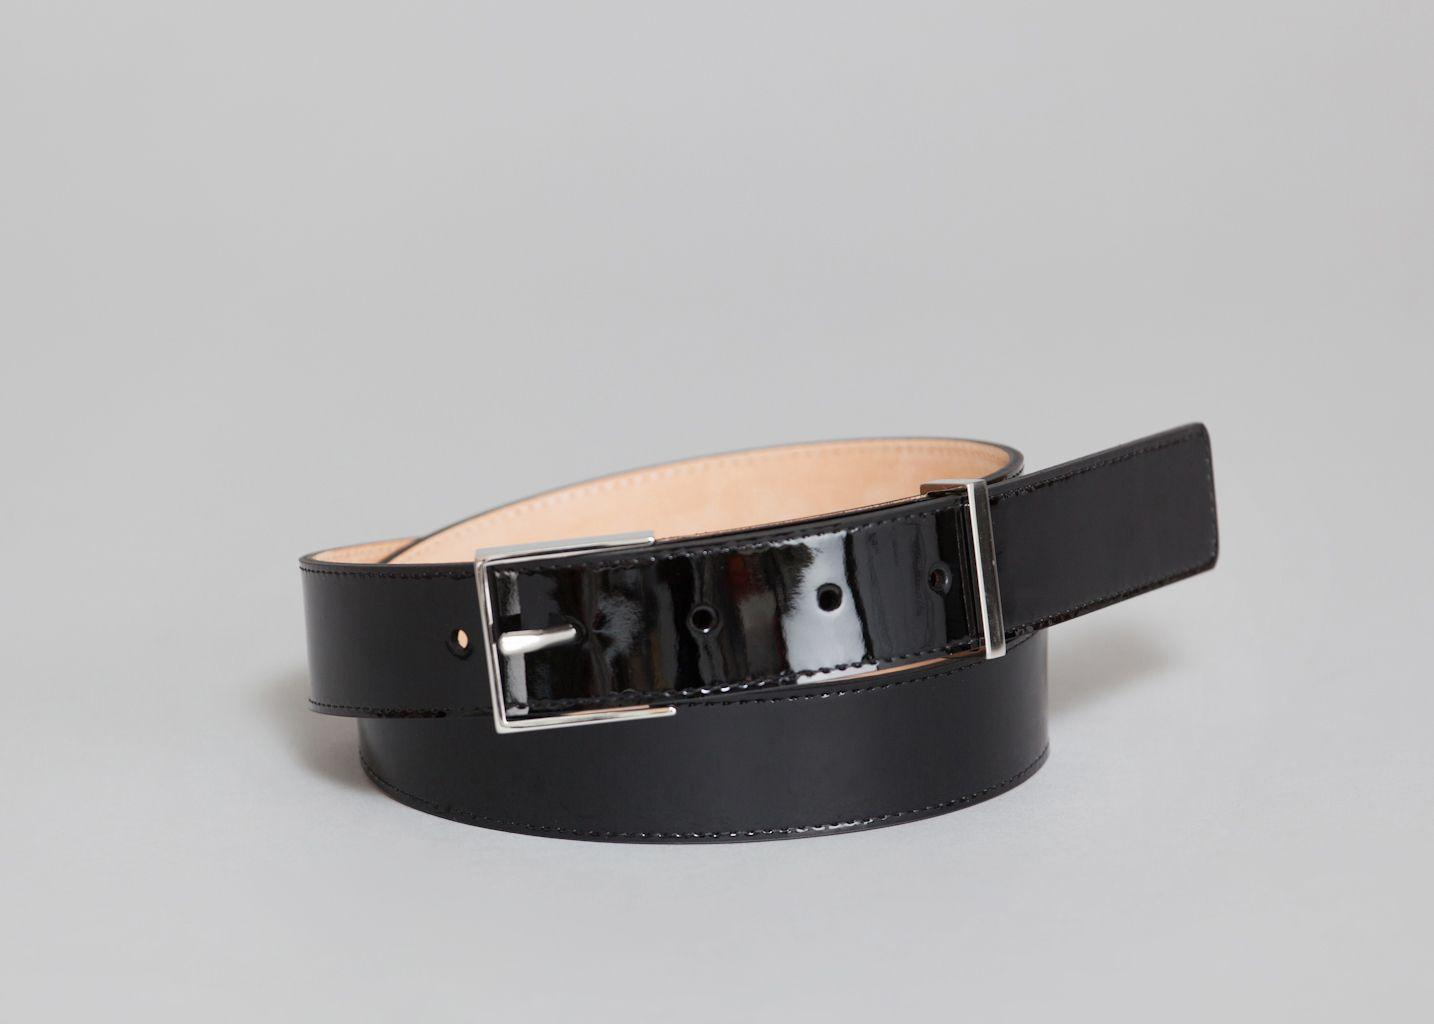 af61df65711c ceinture fine vernie noire femme,ceinture fine cuir femme,ceinture homme  fine pas cher